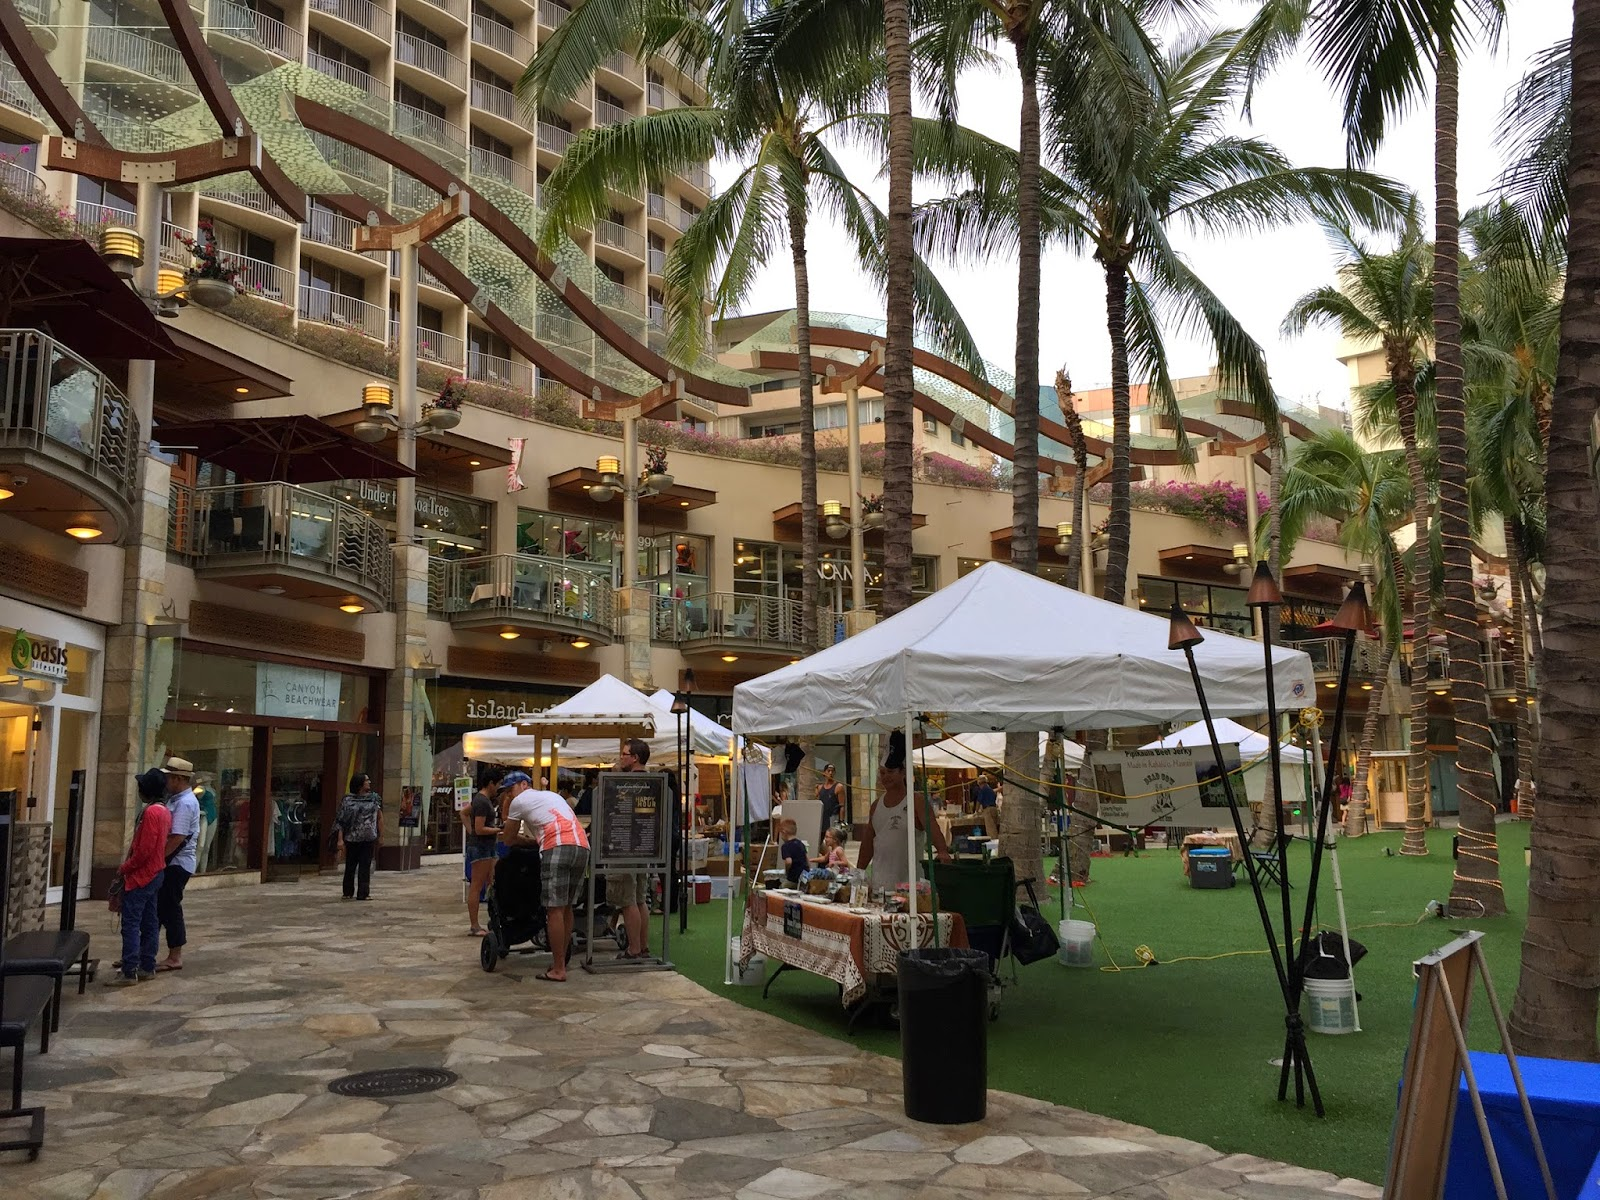 TASTE OF HAWAII RUTHS CHRIS STEAK HOUSE WAIKIKI